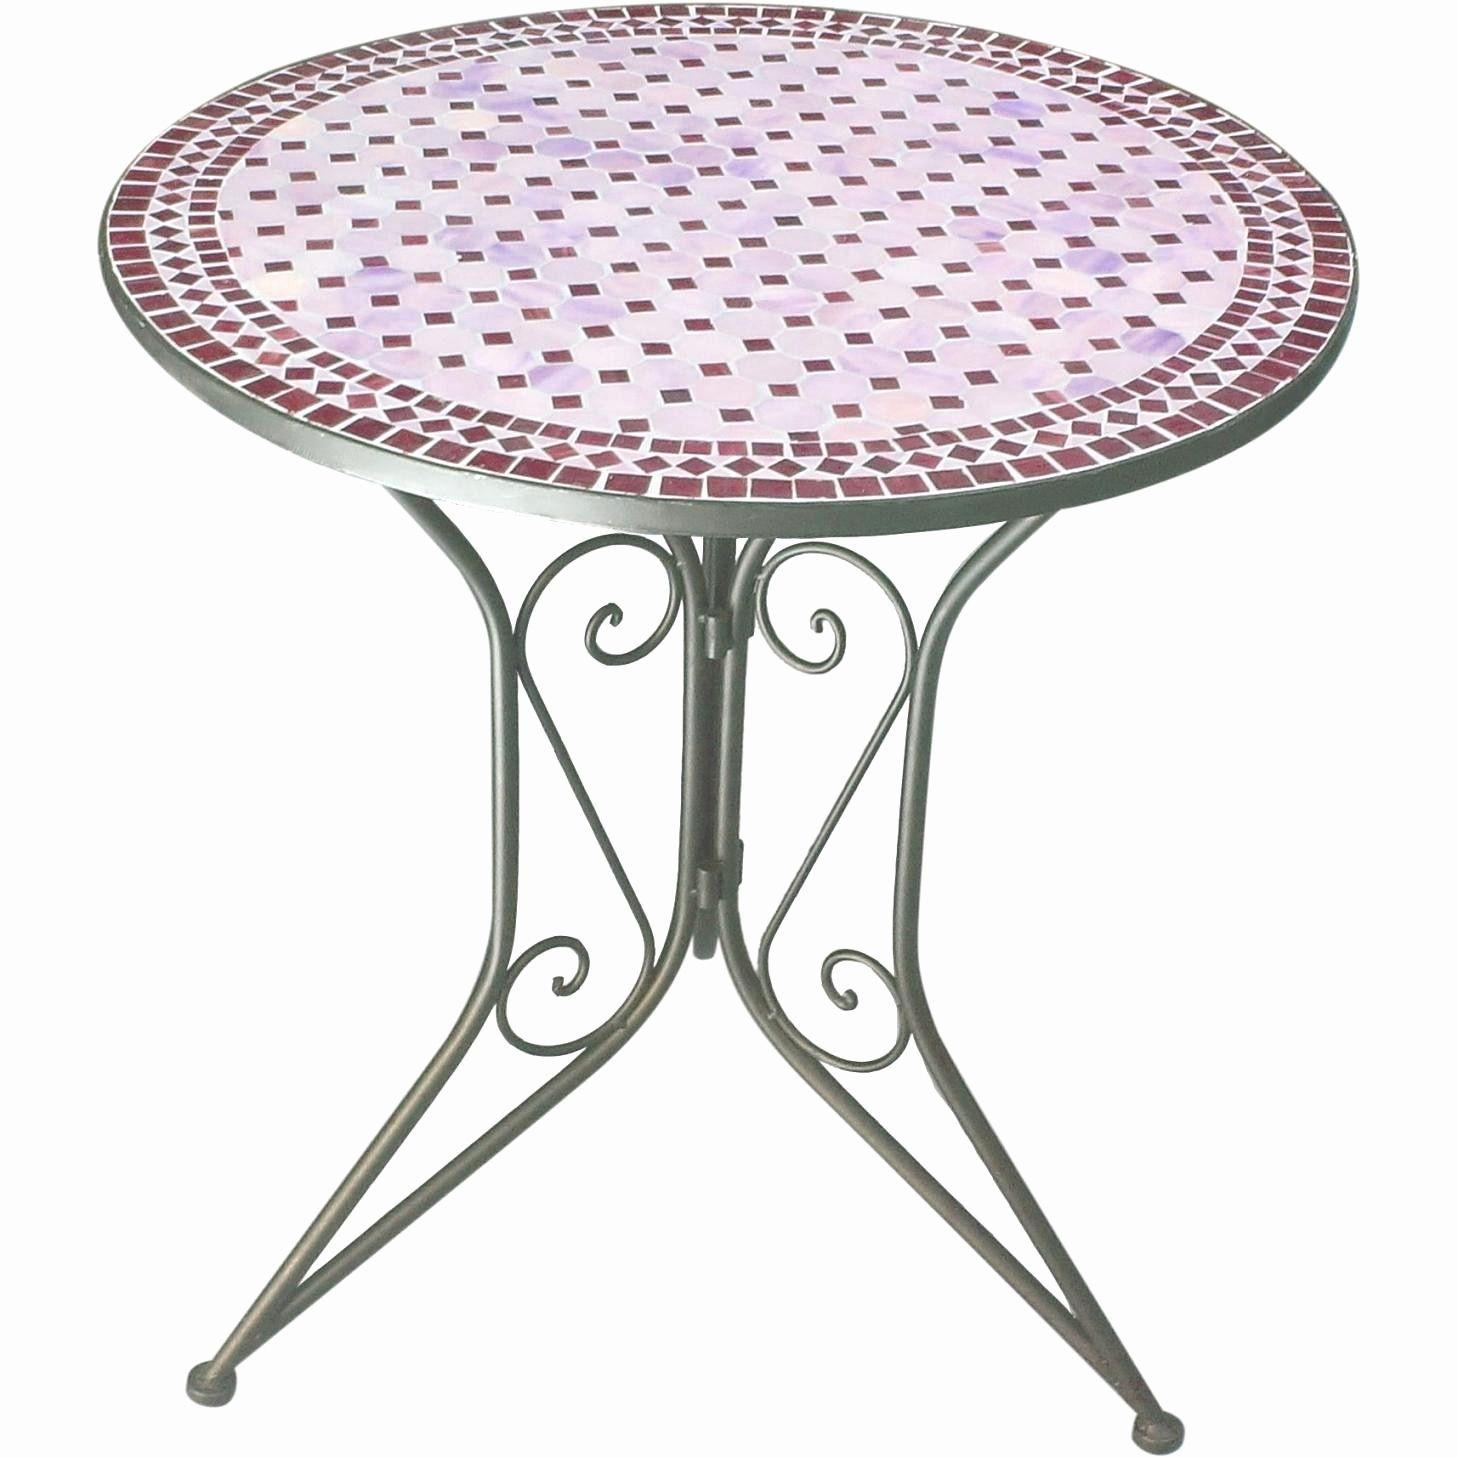 Table De Jardin Ronde Inspirant Table De Jardin Ceramique ... encequiconcerne Table Jardin Ceramique